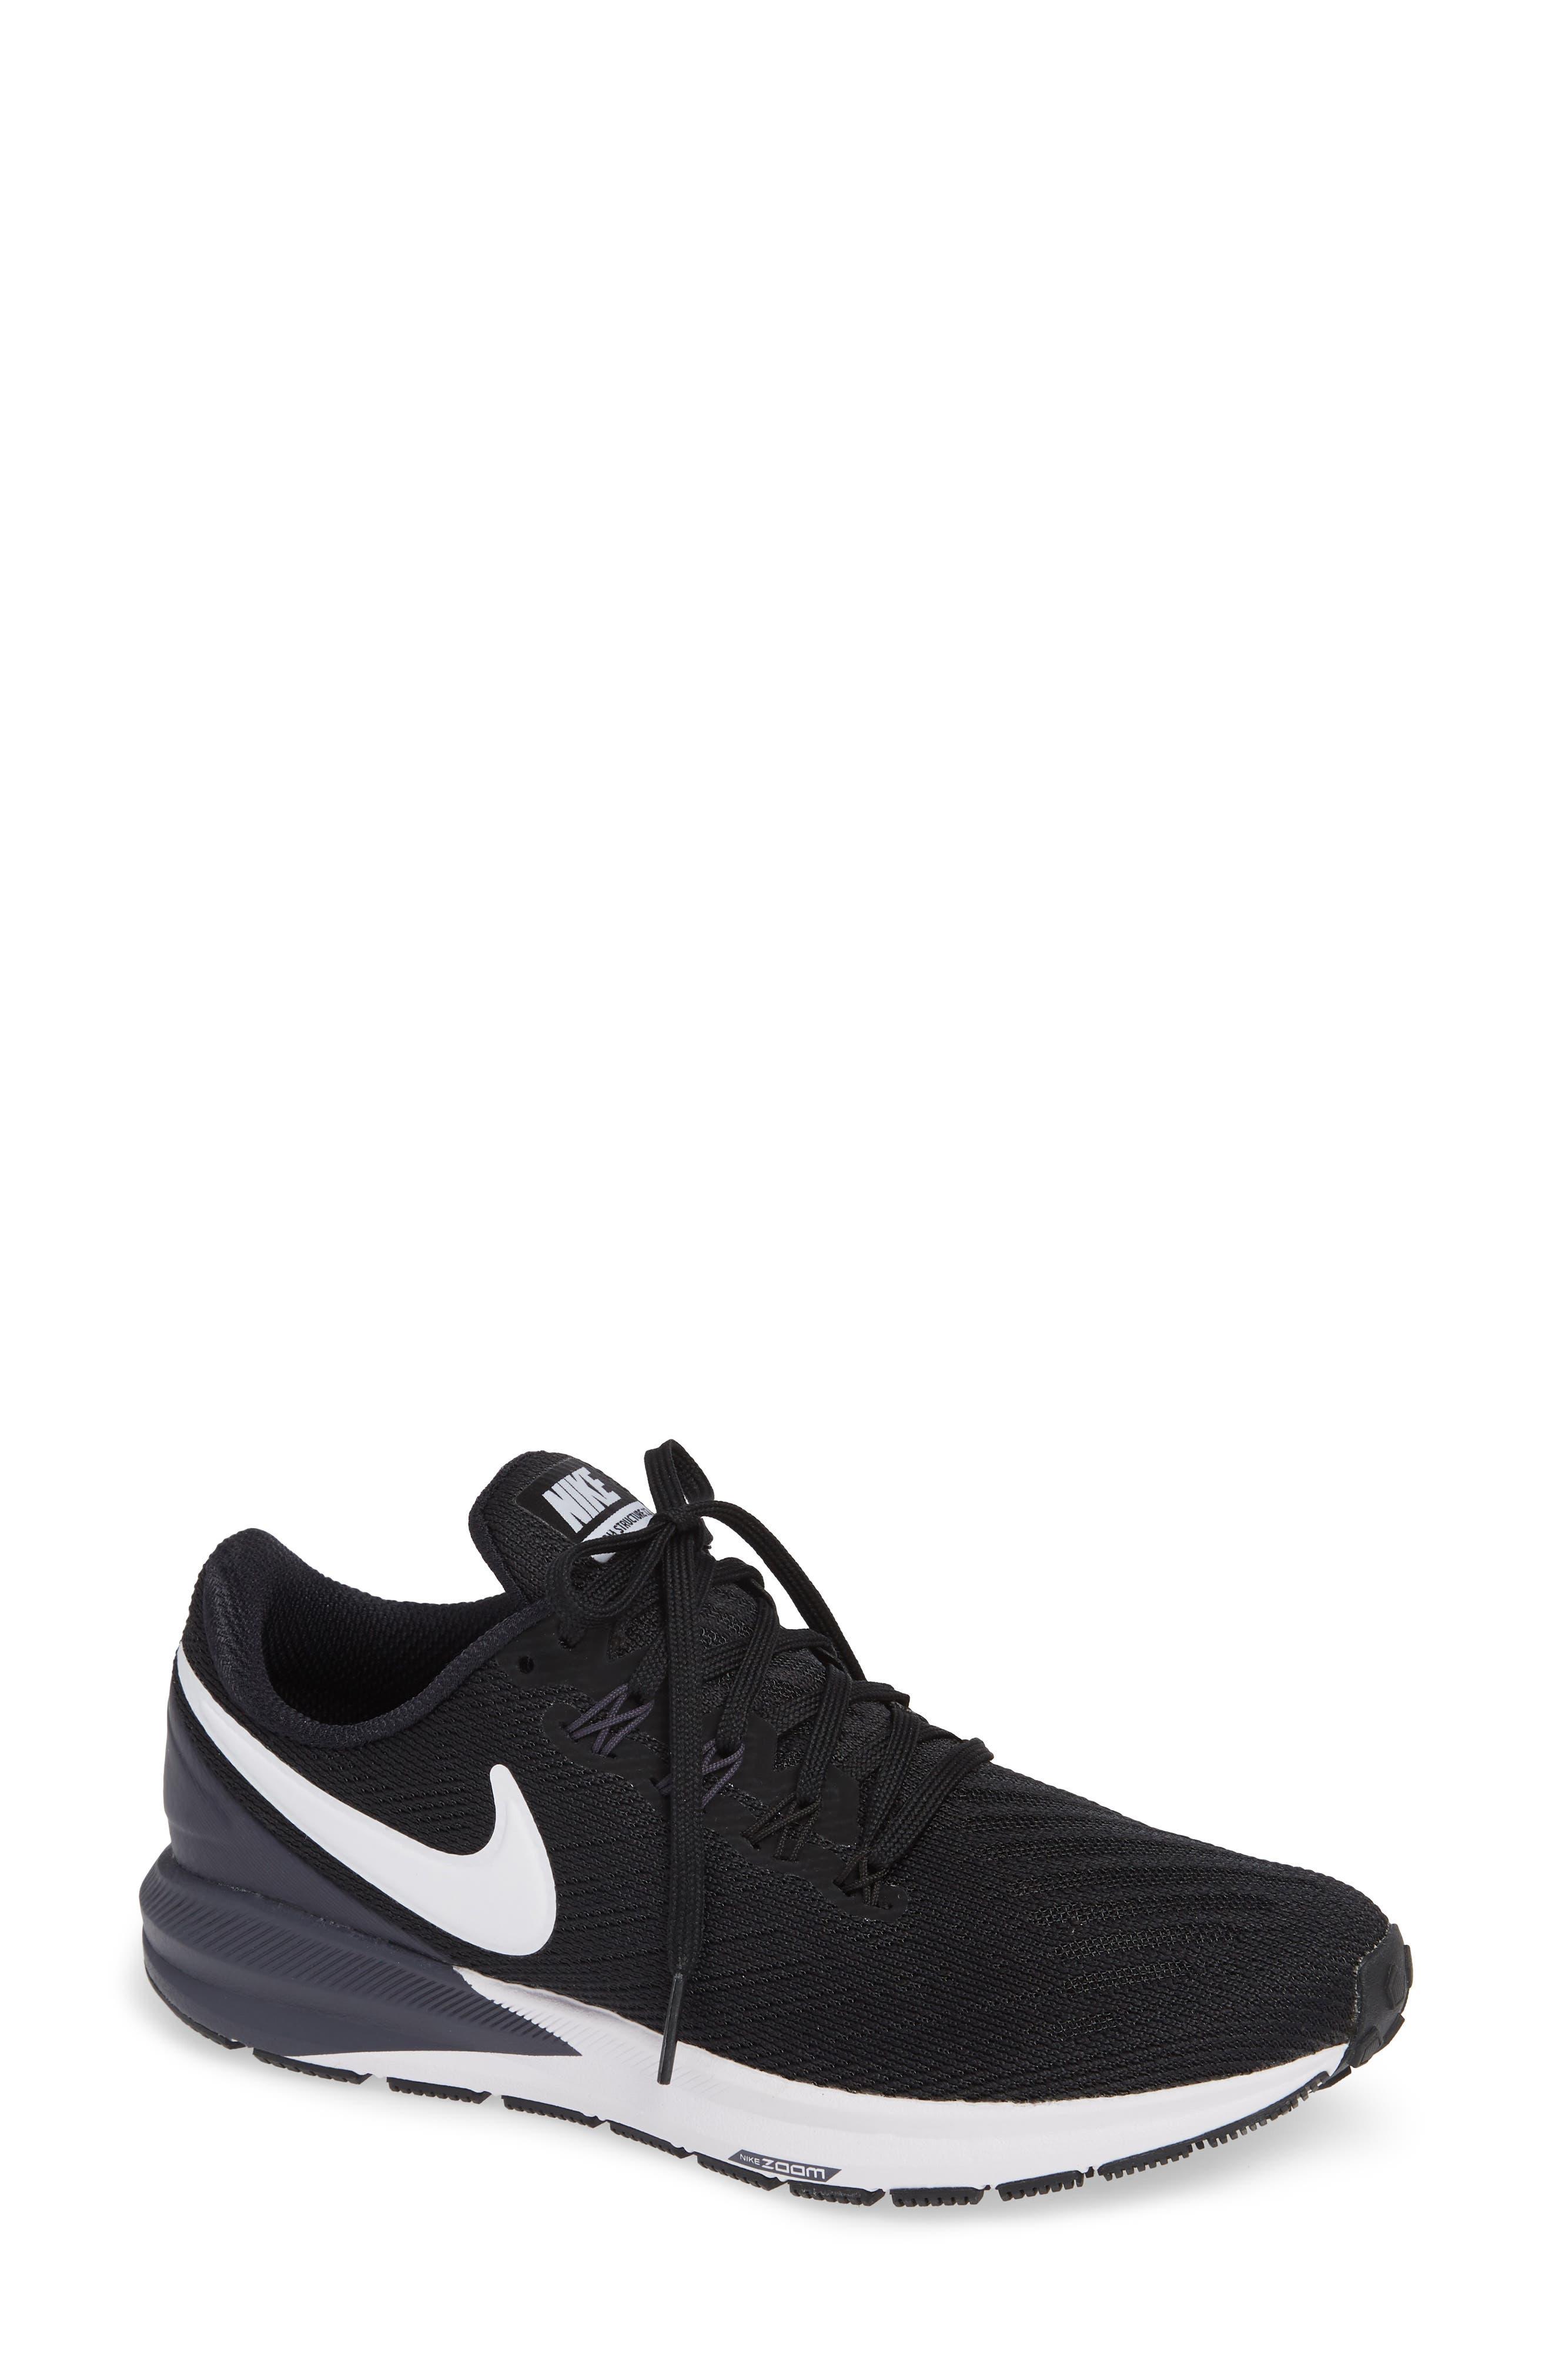 NIKE, Air Zoom Structure 22 Sneaker, Main thumbnail 1, color, BLACK/ WHITE-GRIDIRON